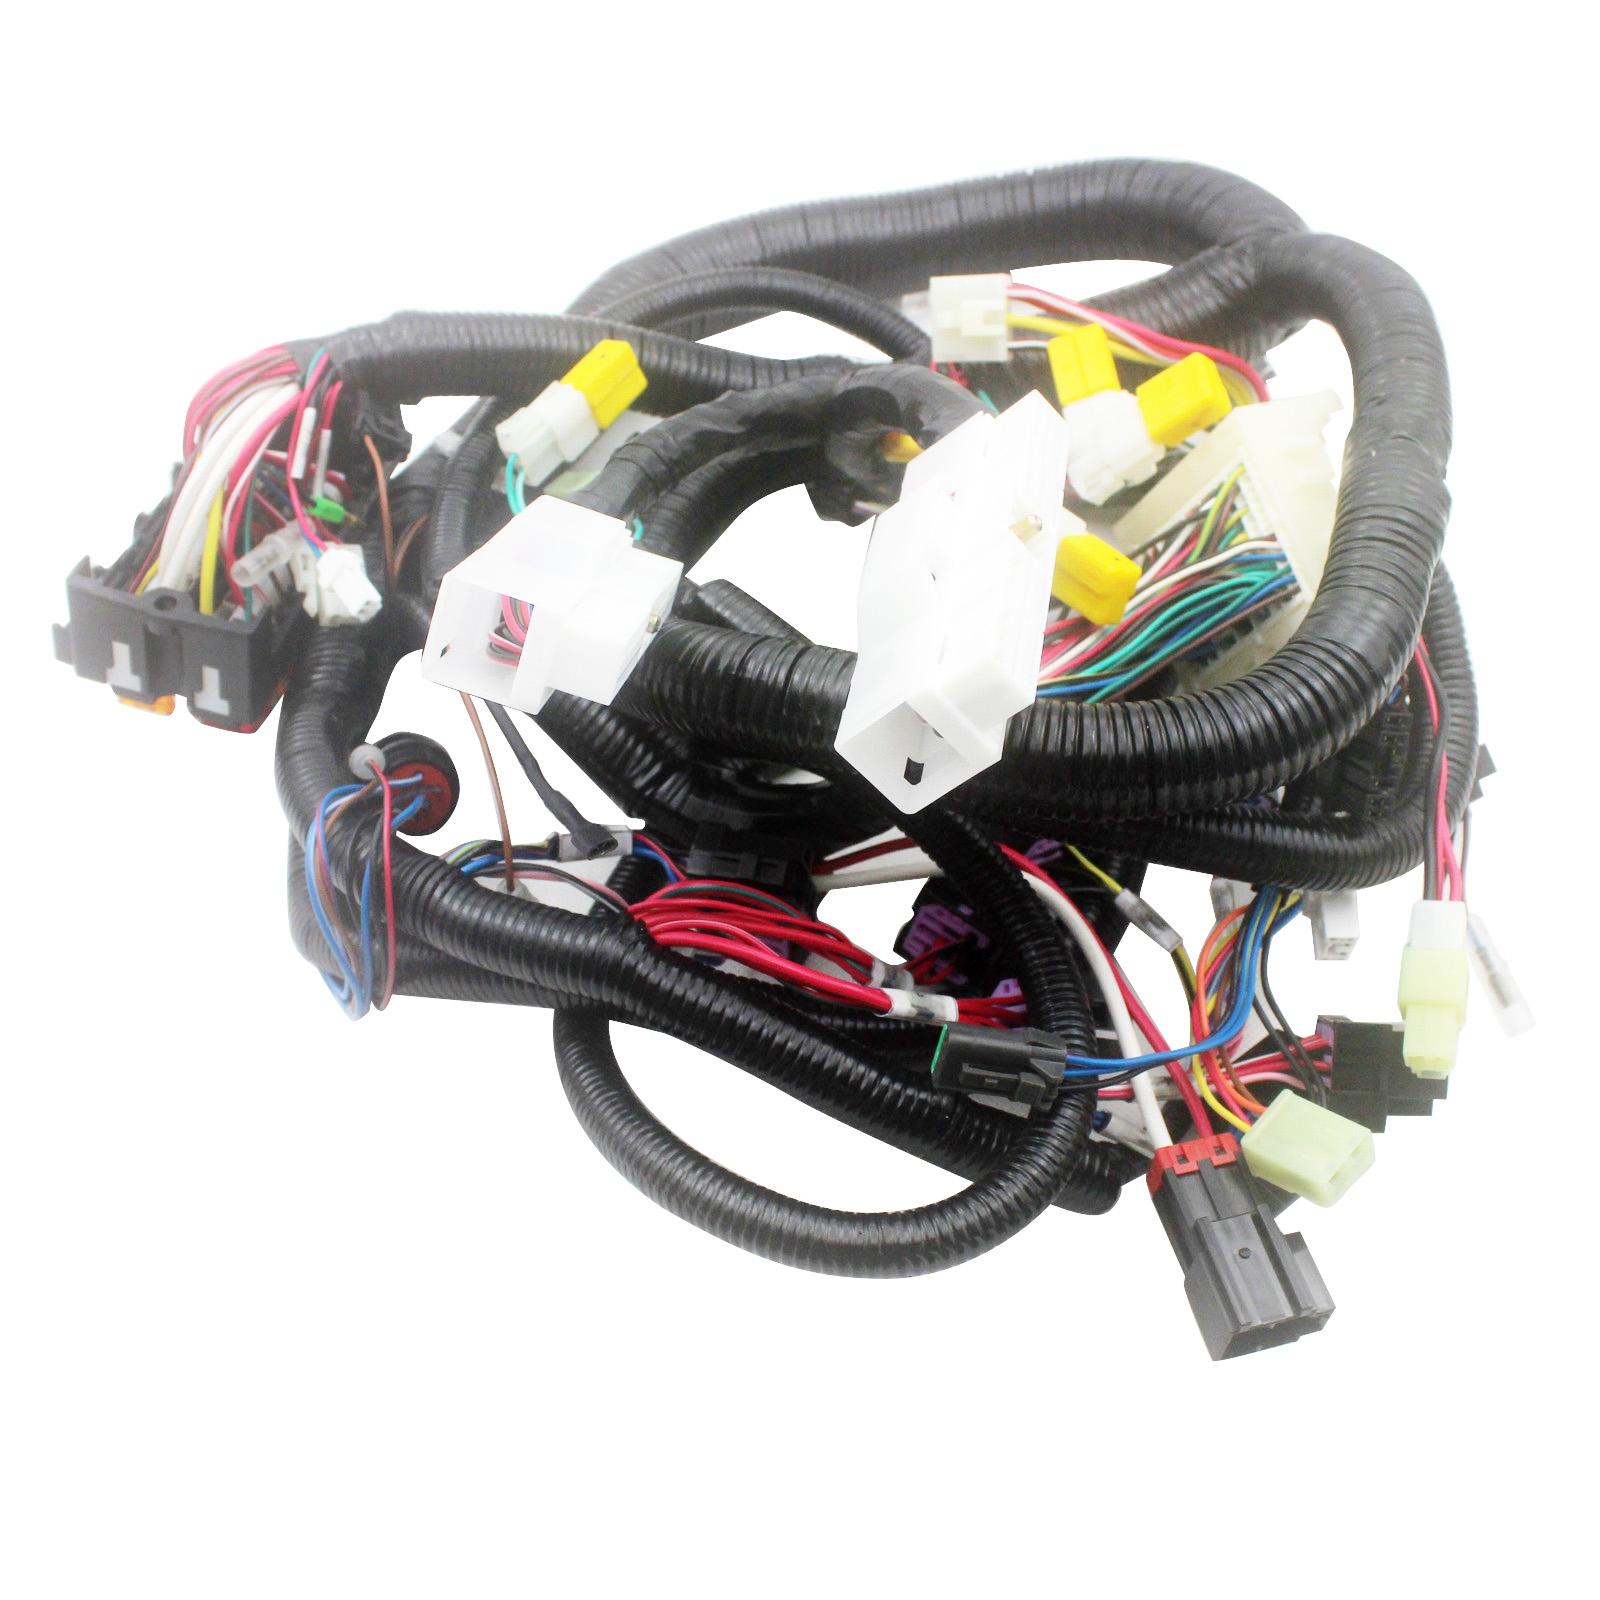 0001044 Internal Inner Cabin Wiring Harness For Hitachi Ex200 2 Starter Excavator Parts